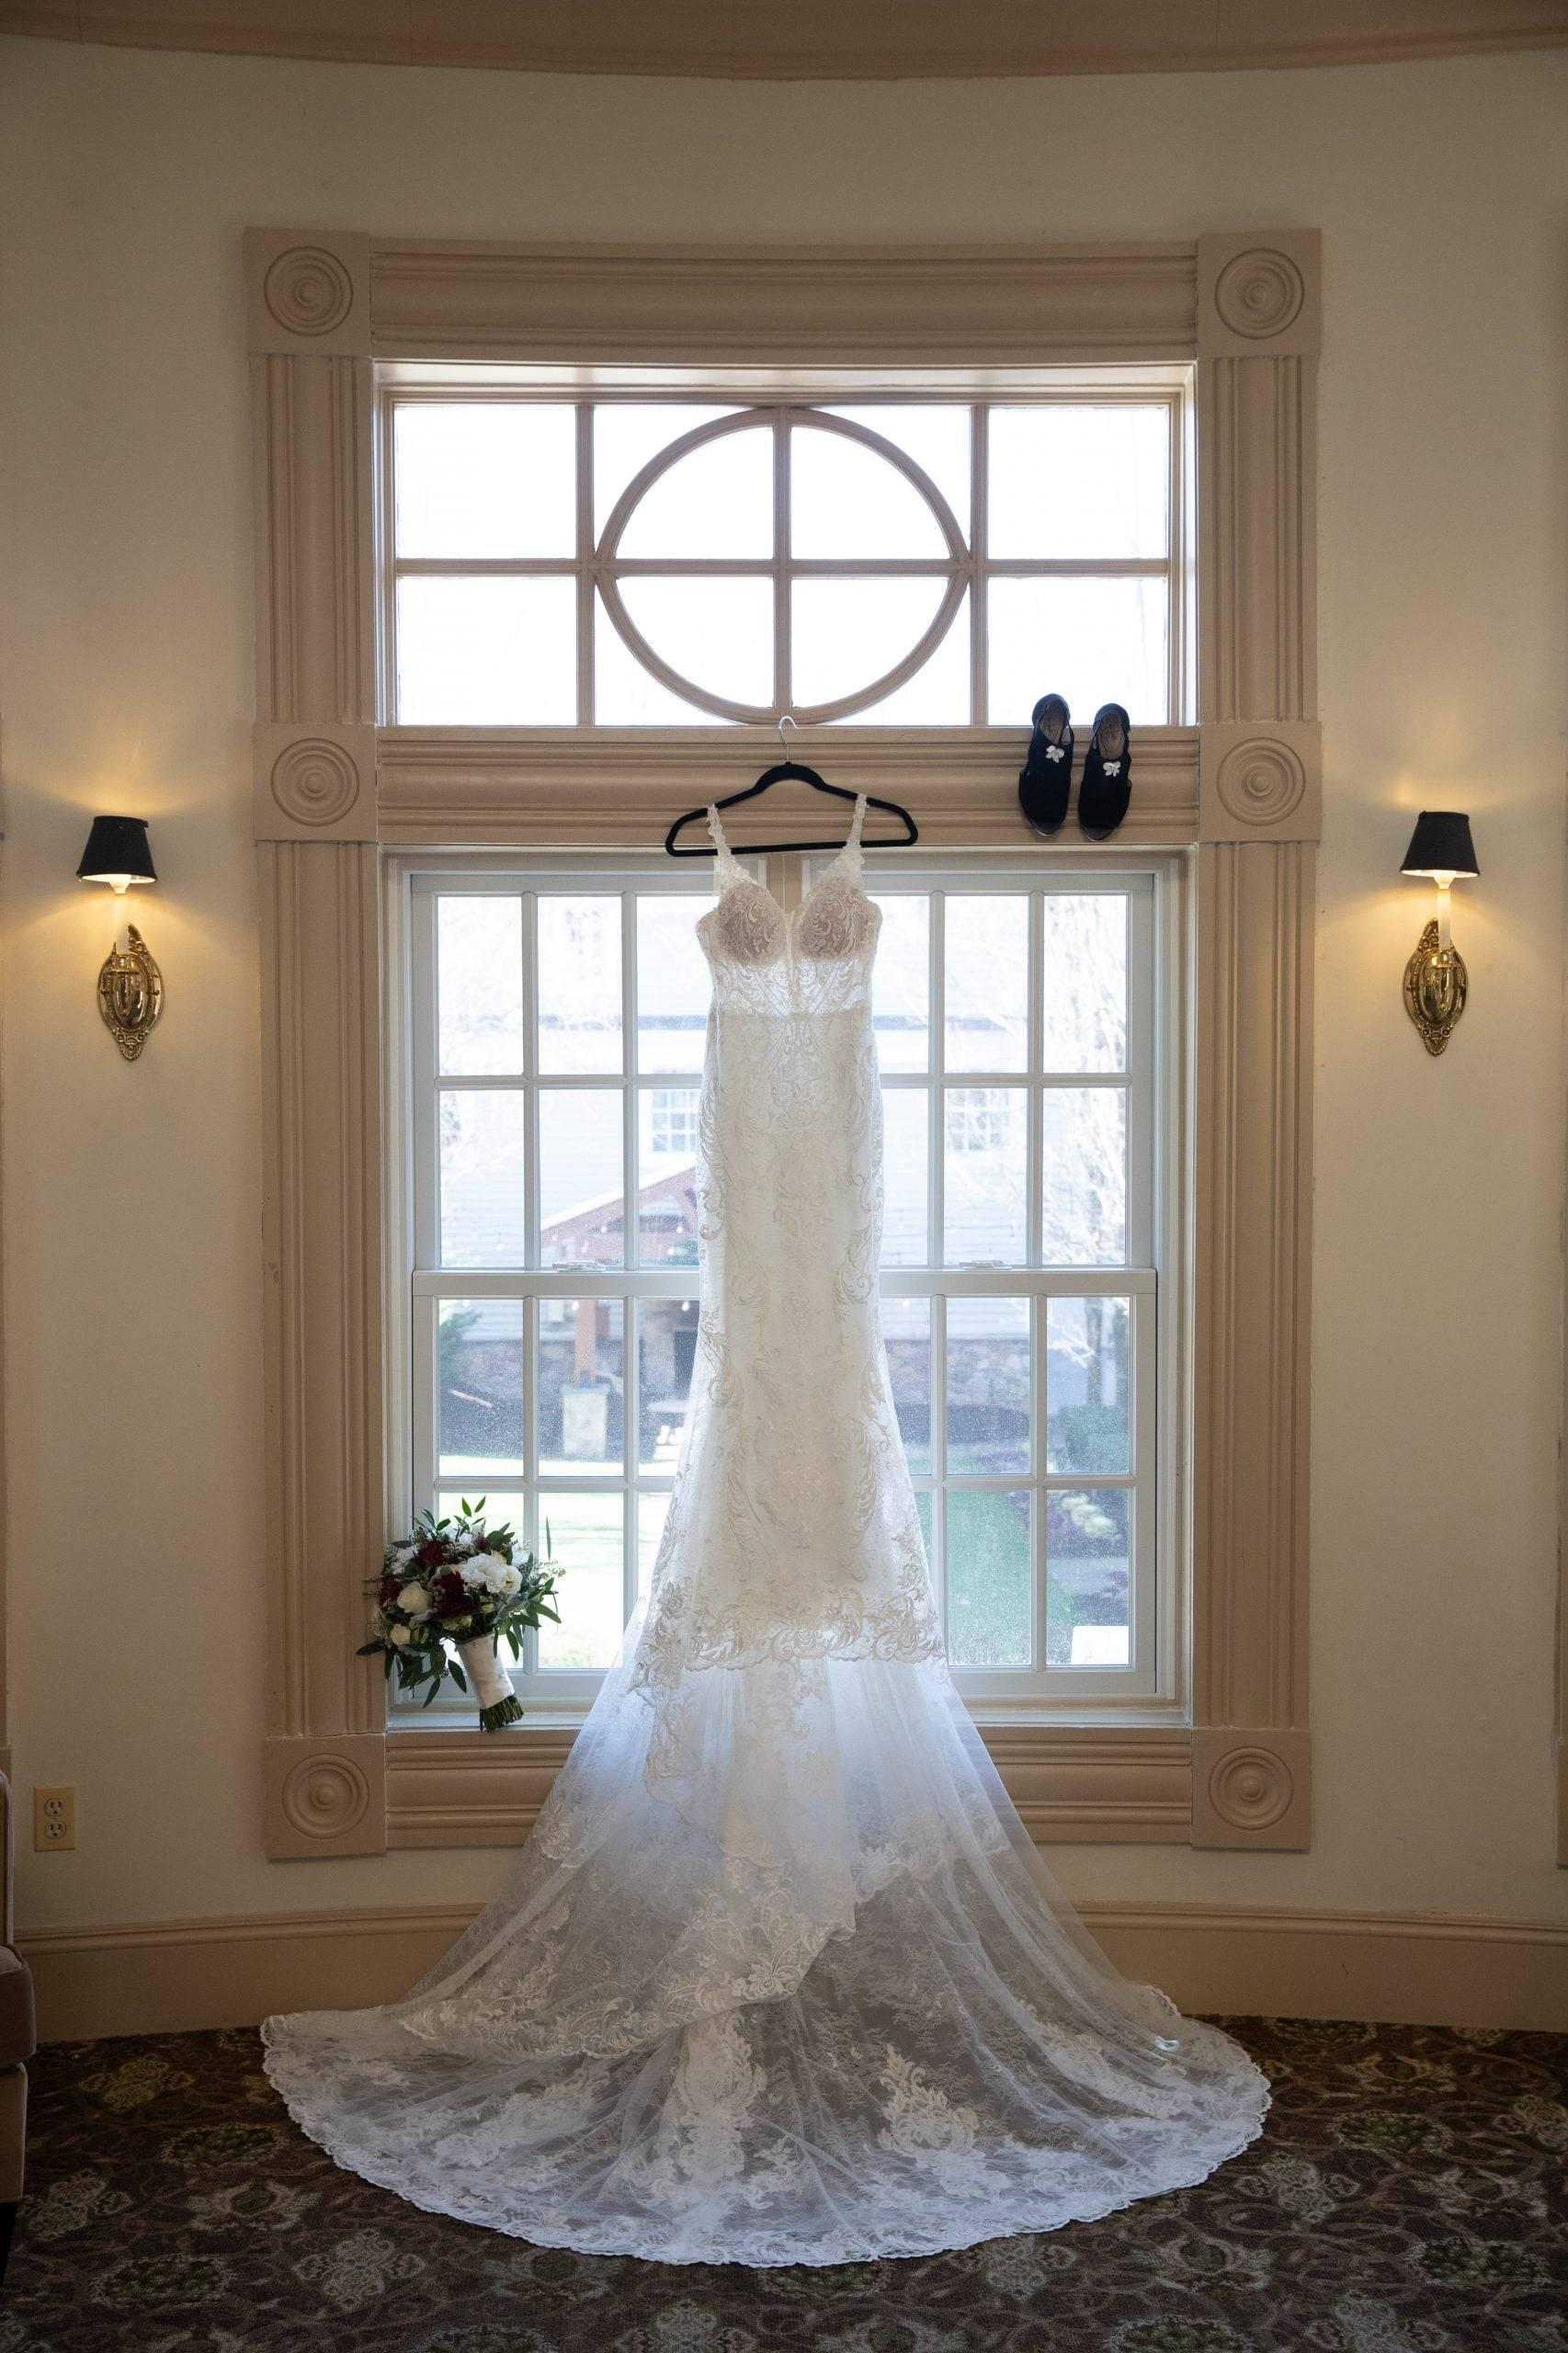 Olde Mill Inn wedding dress hanging